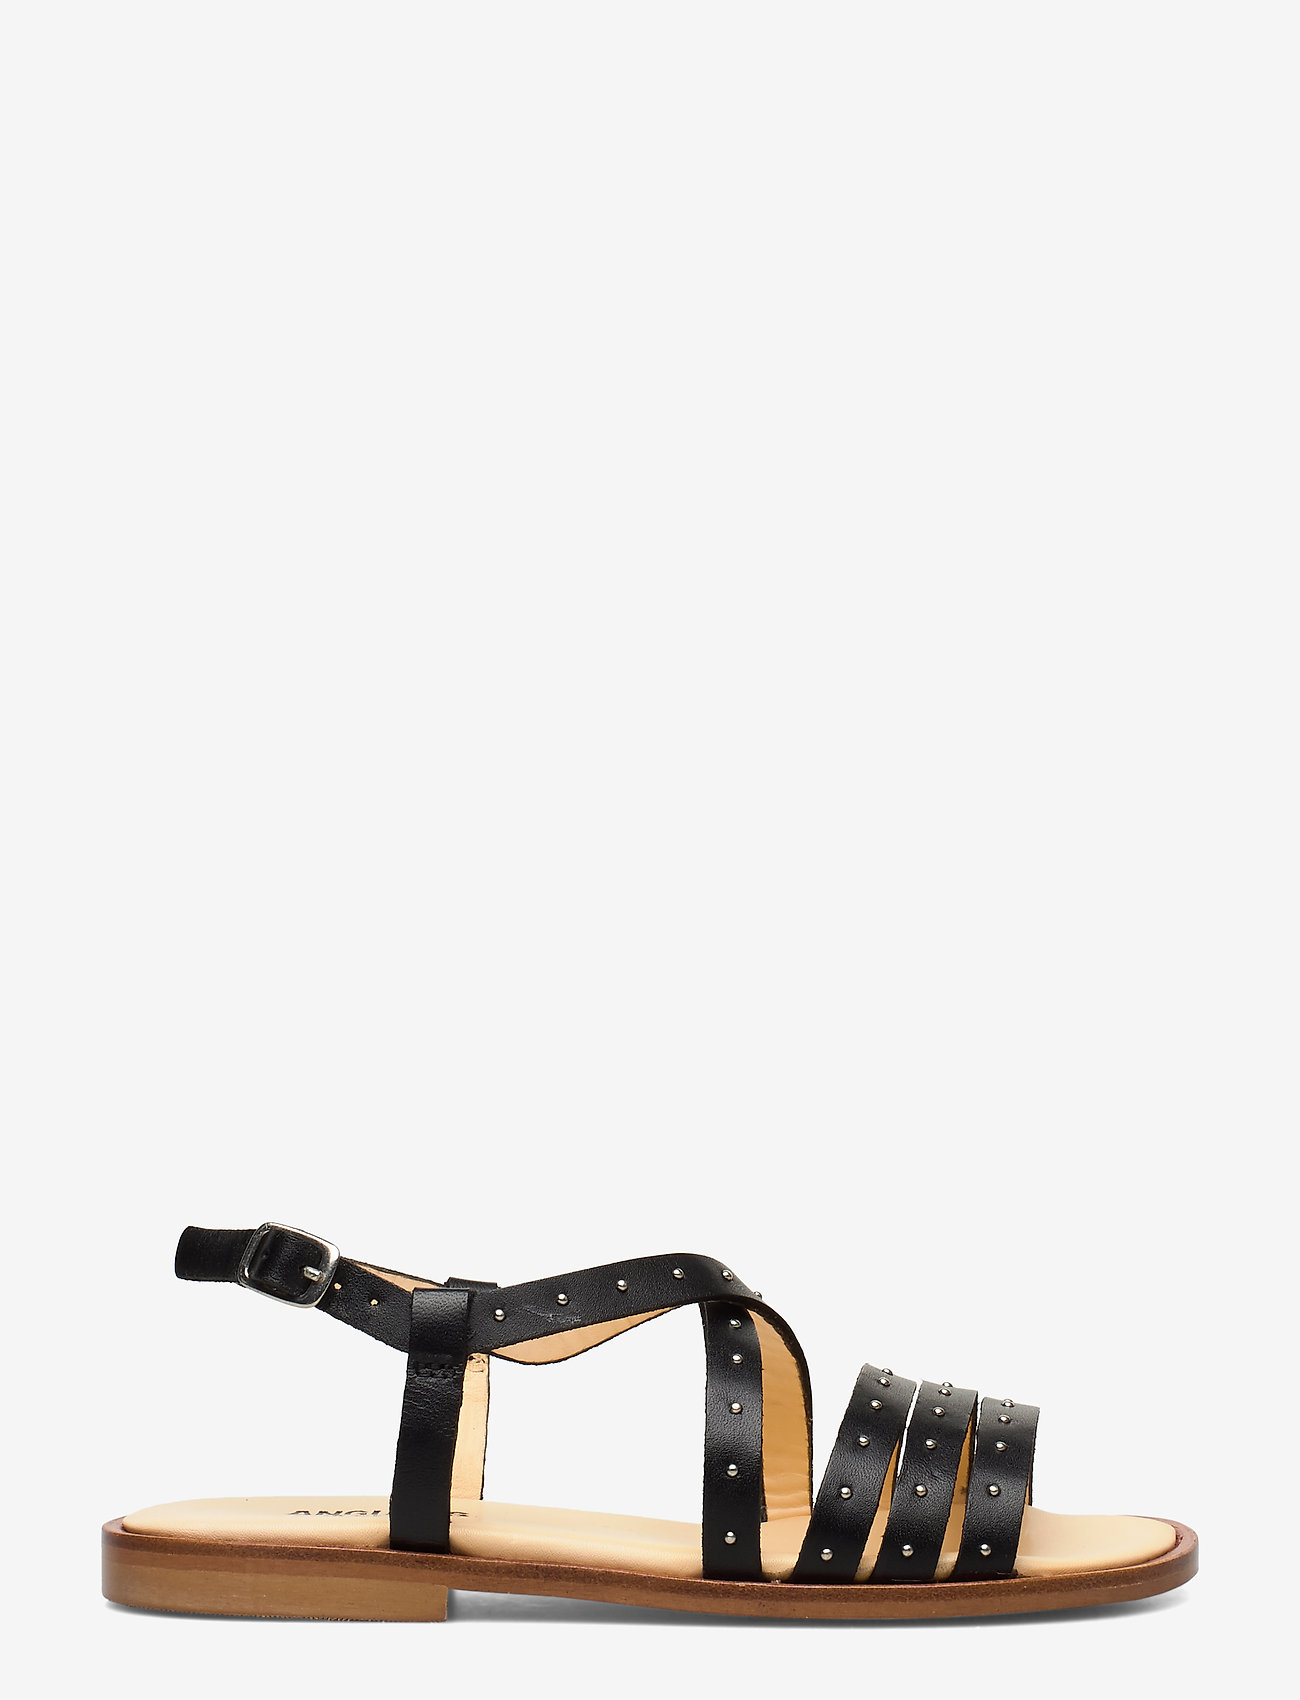 ANGULUS - Sandals - flat - open toe - op - platta sandaler - 1785 black - 1